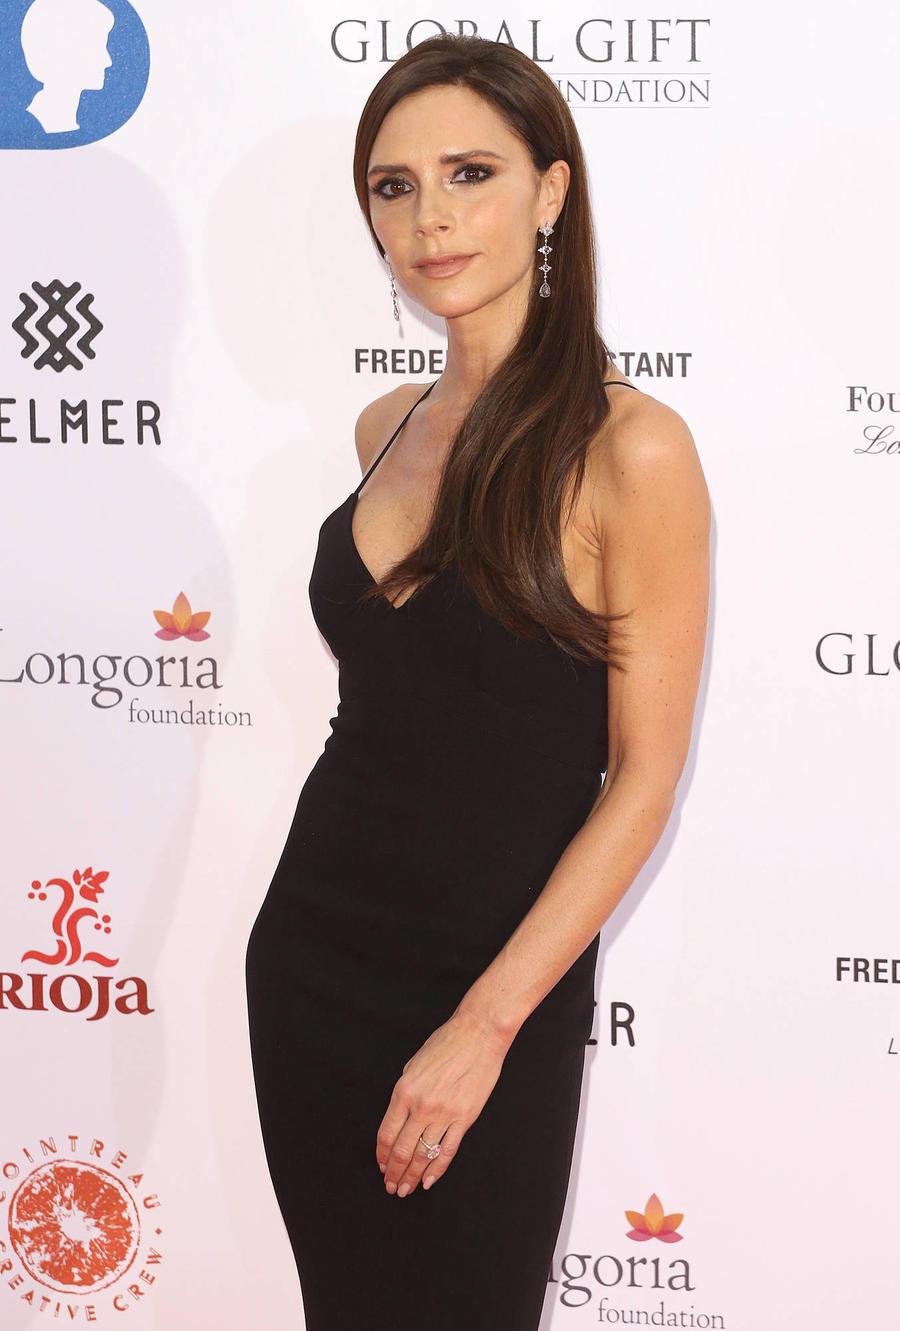 Victoria Beckham Creating Estee Lauder Makeup Line